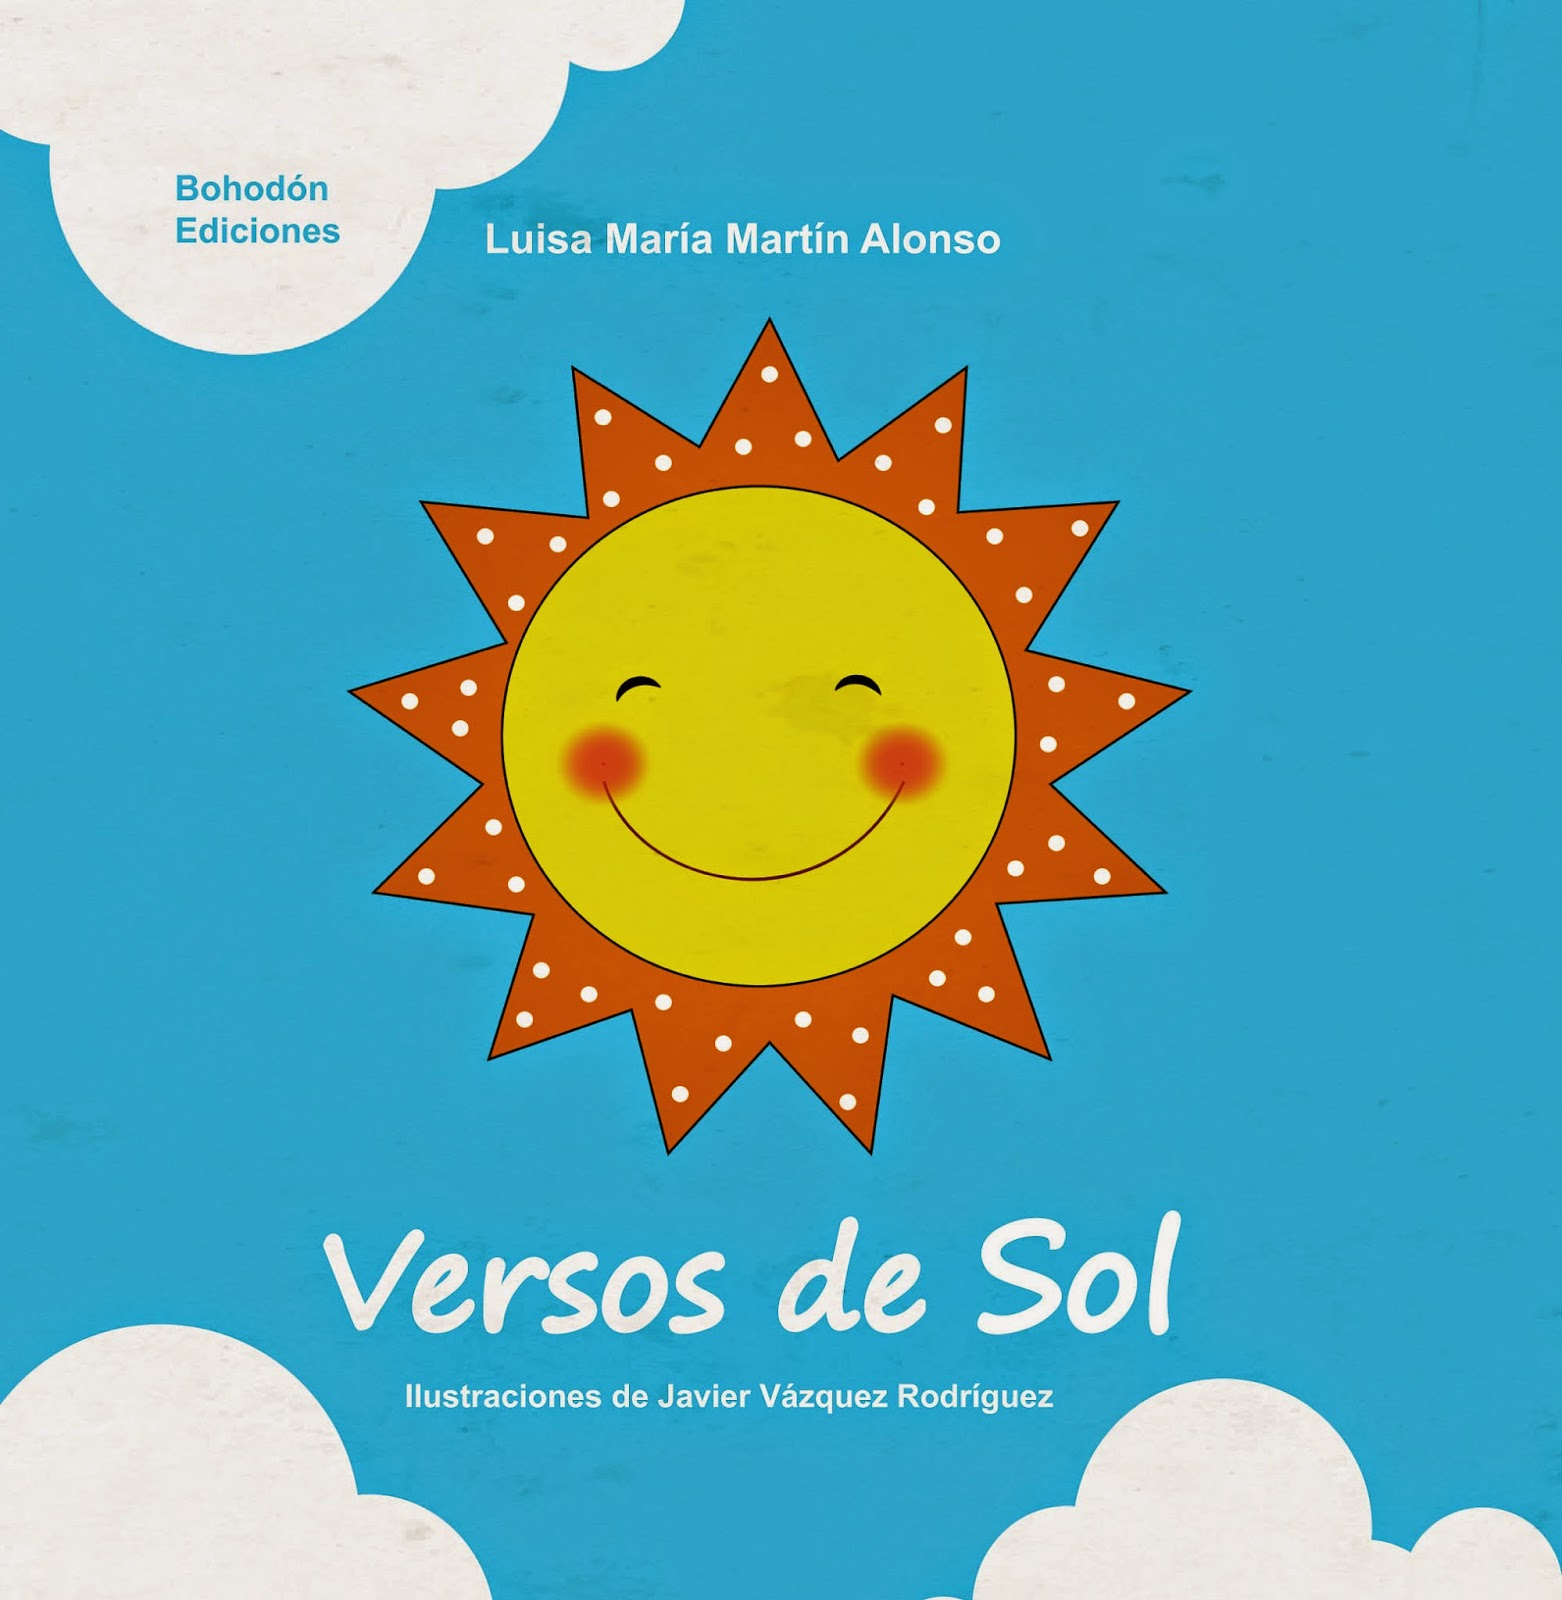 versos de sol